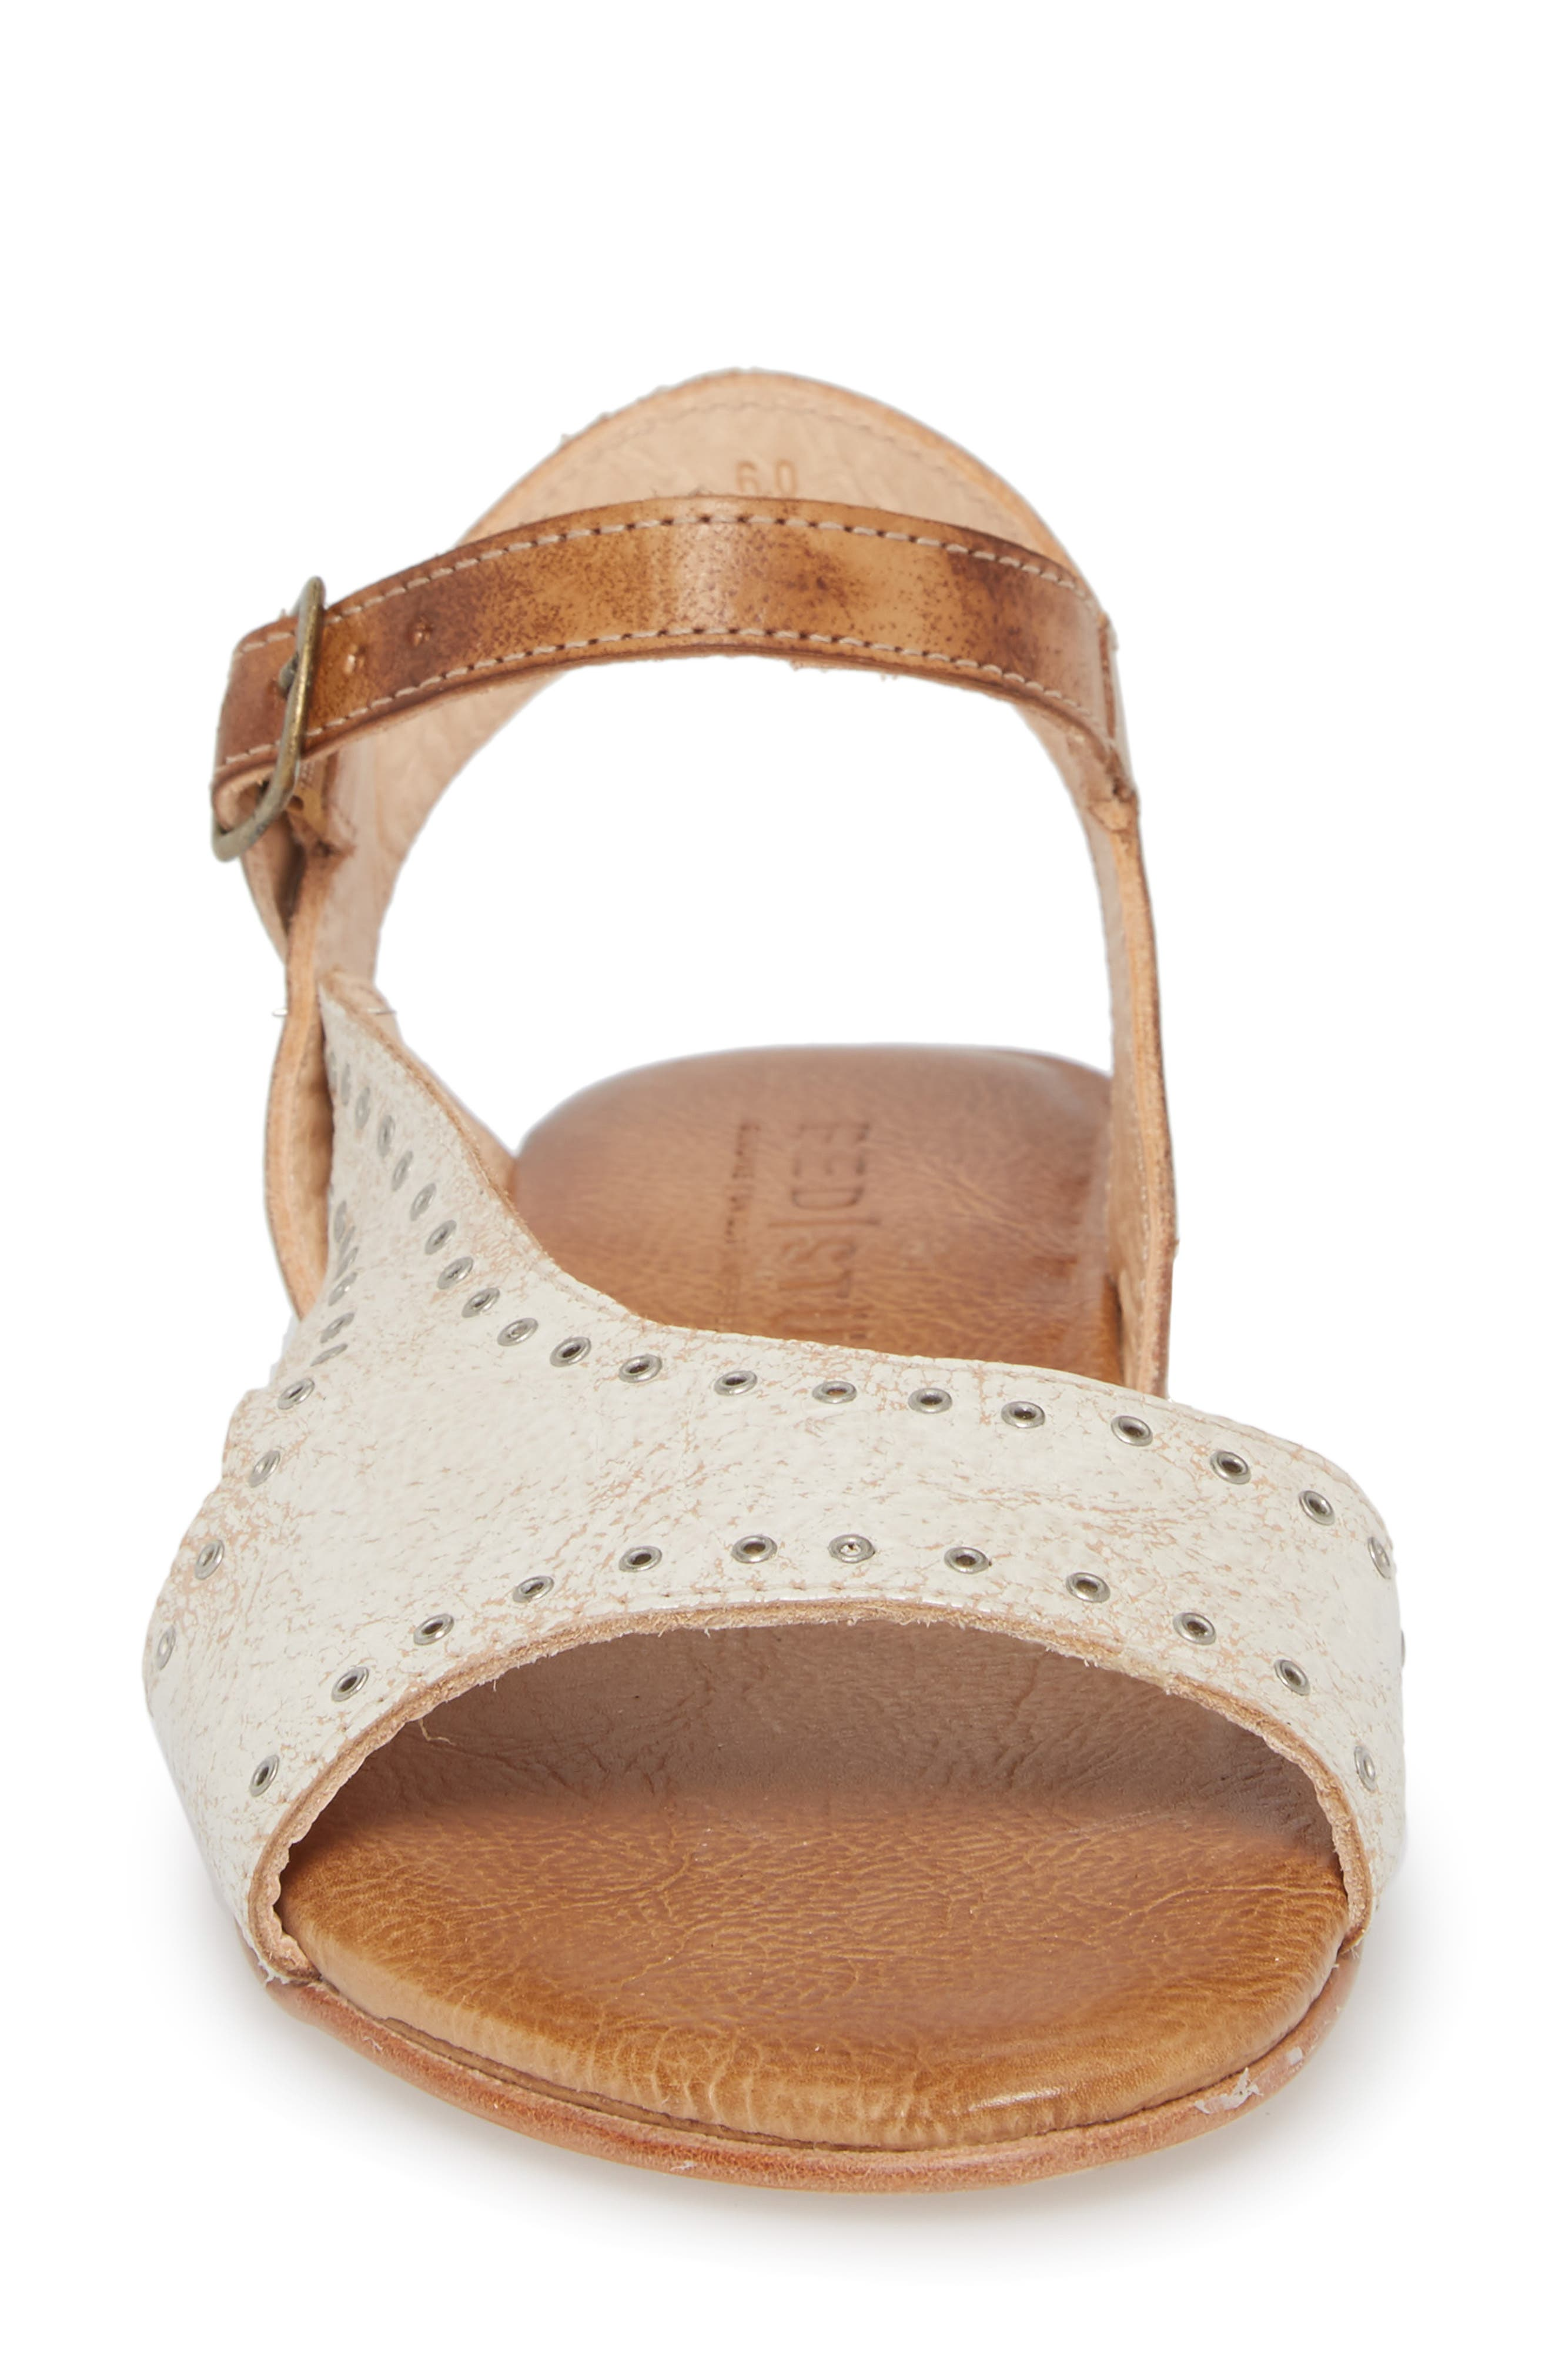 Auburn Flat Sandal,                             Alternate thumbnail 4, color,                             Nectar/ Tan Leather